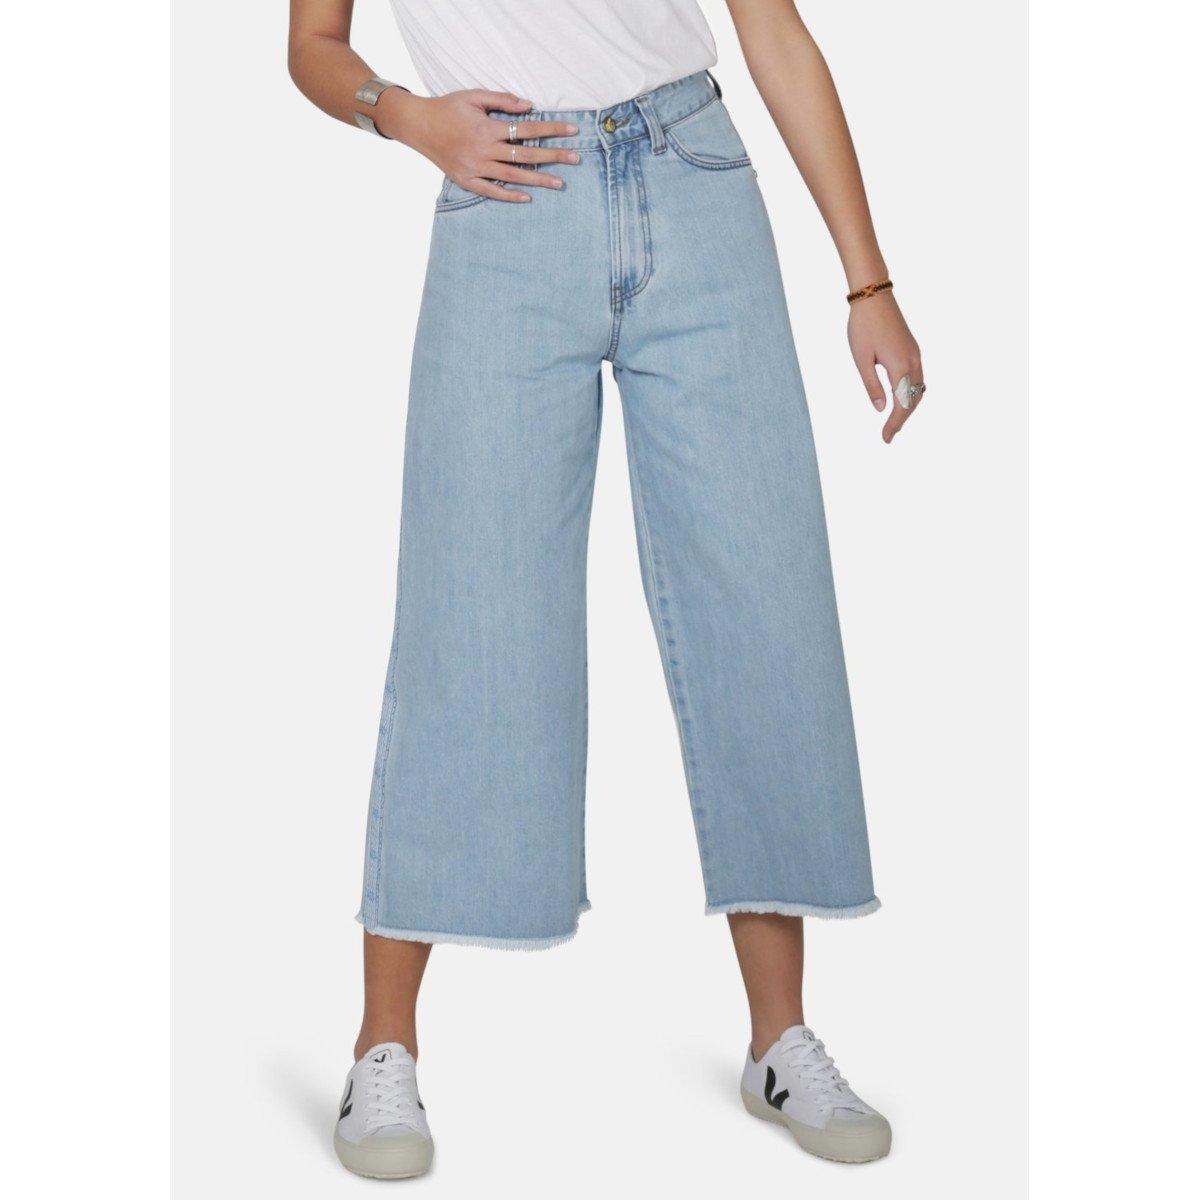 Jeans Crop a gamba larga Light Wash 100% cotone biologico